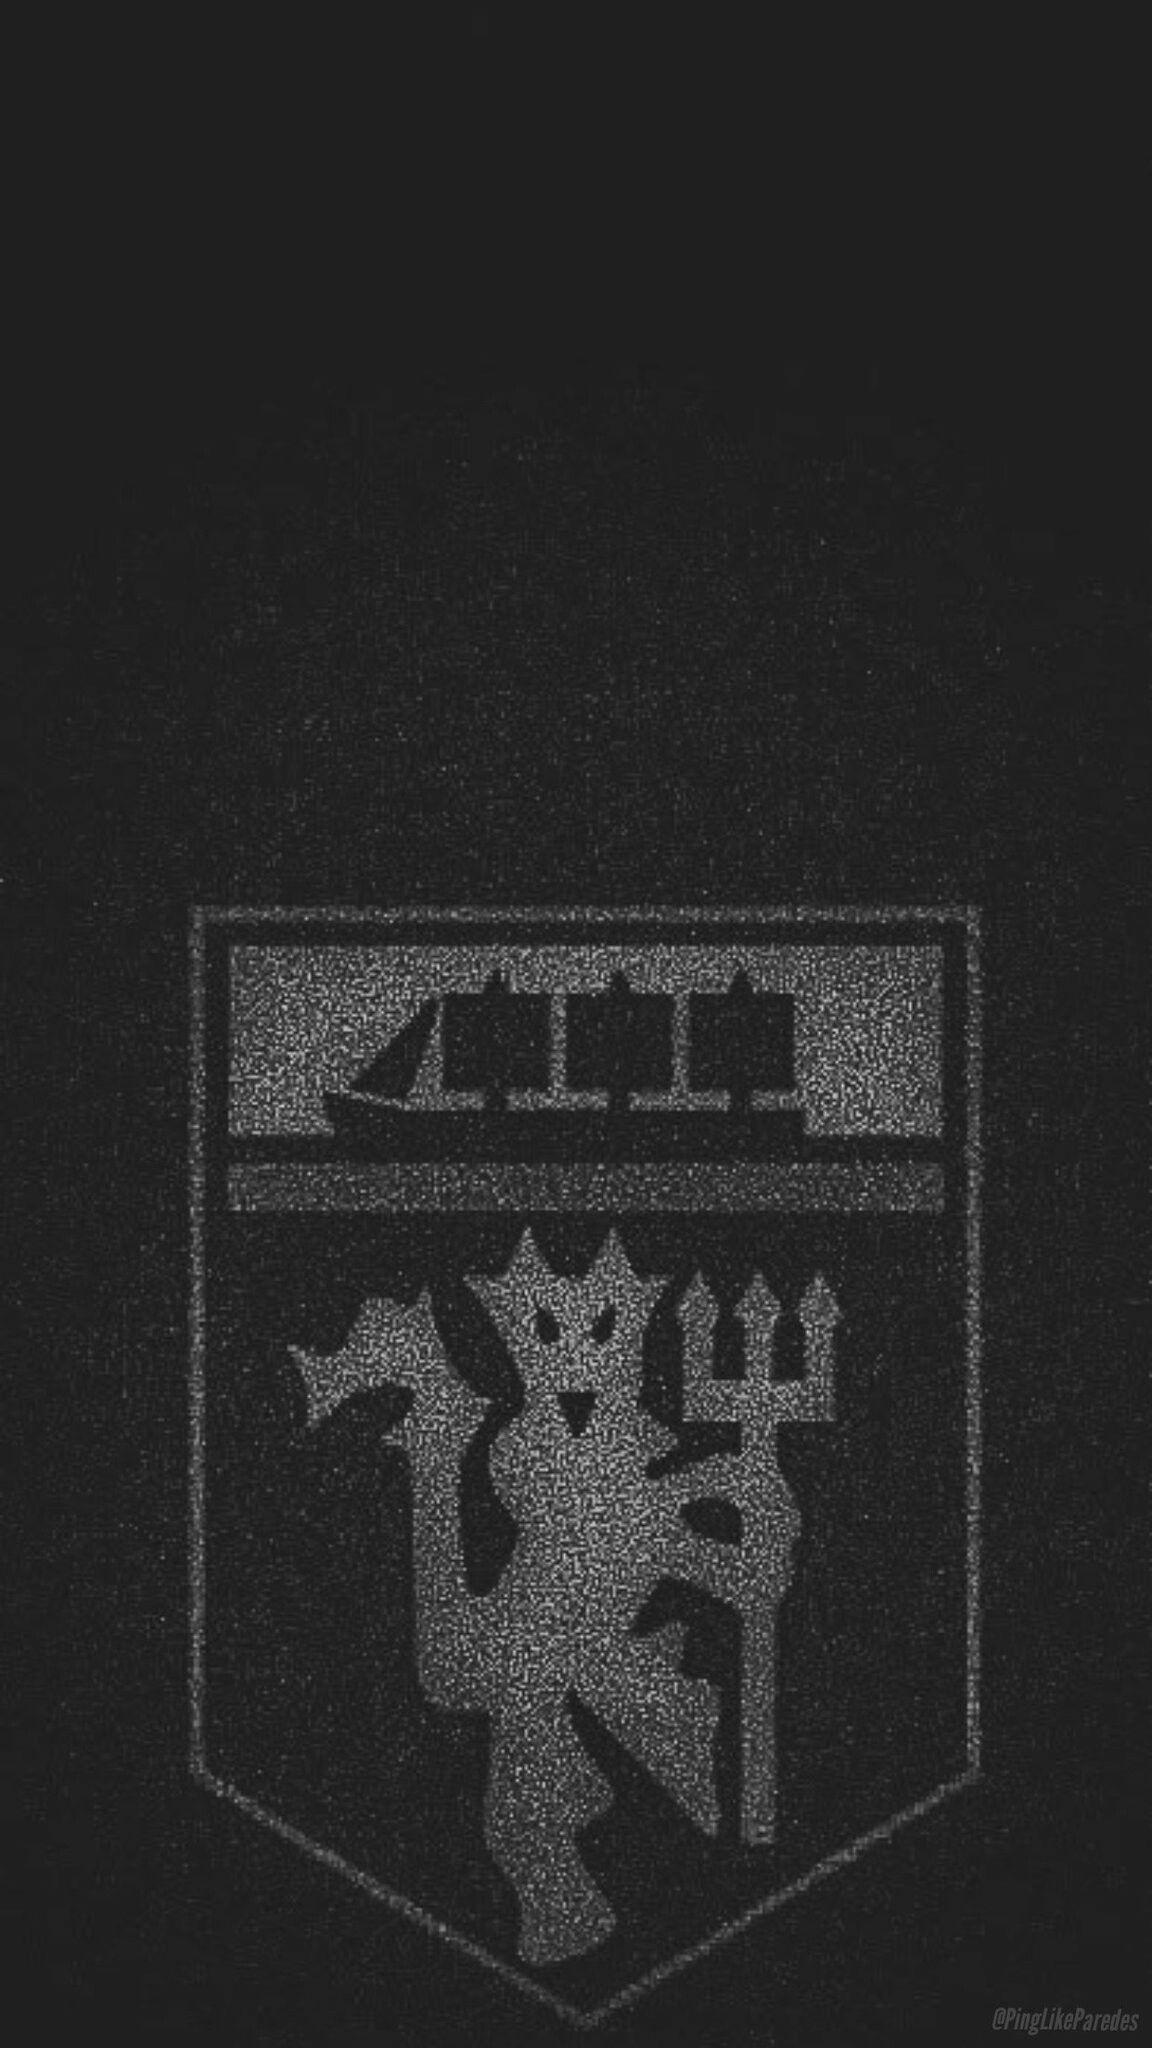 Manchester United Logo Sepak Bola Gambar Wallpaper Ponsel